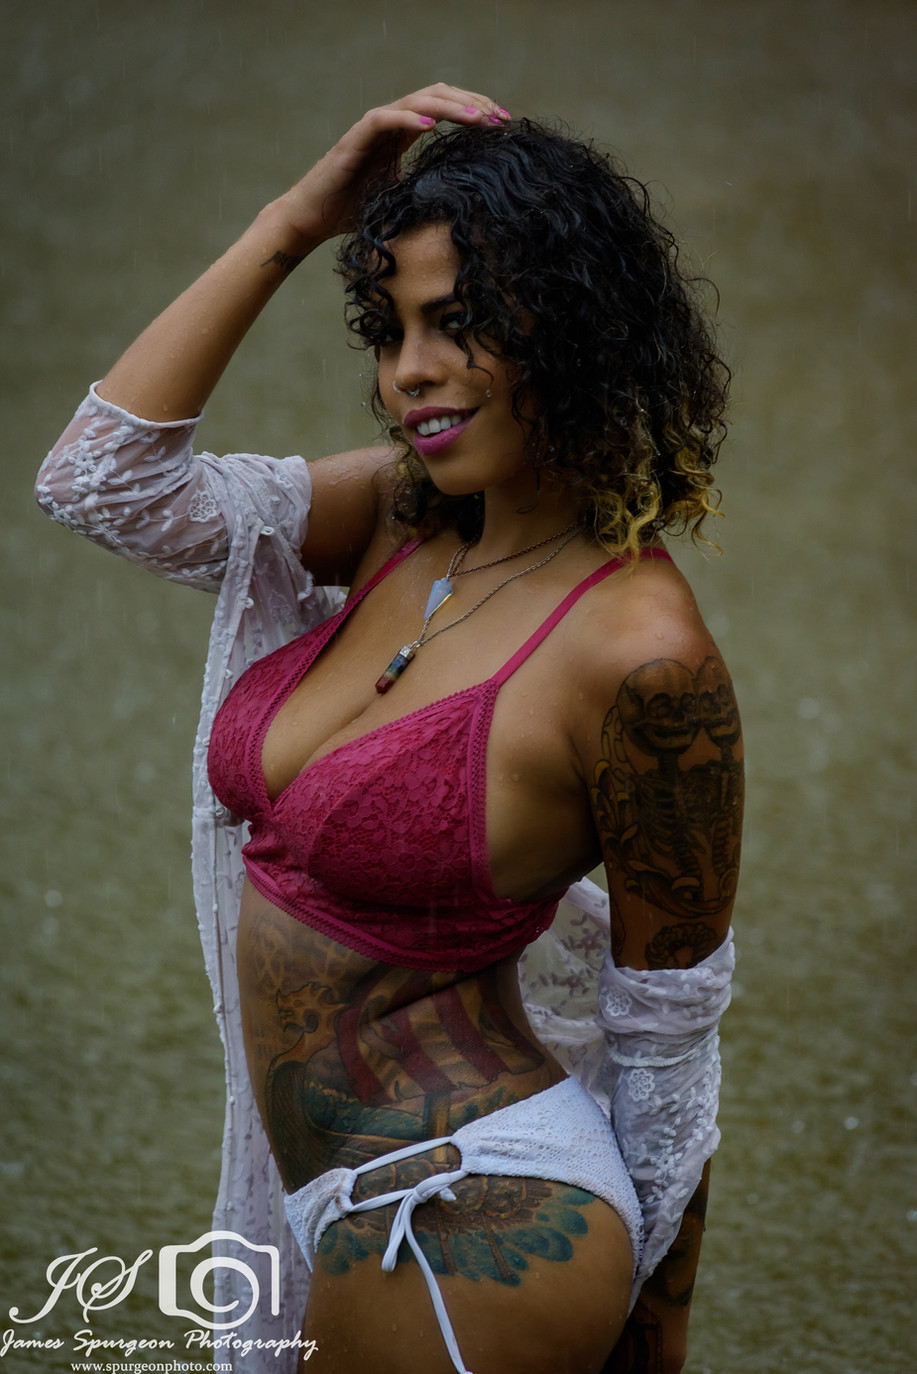 Photographer: Jimmy Spurgeon | MUAH/Model: Ruby Noir